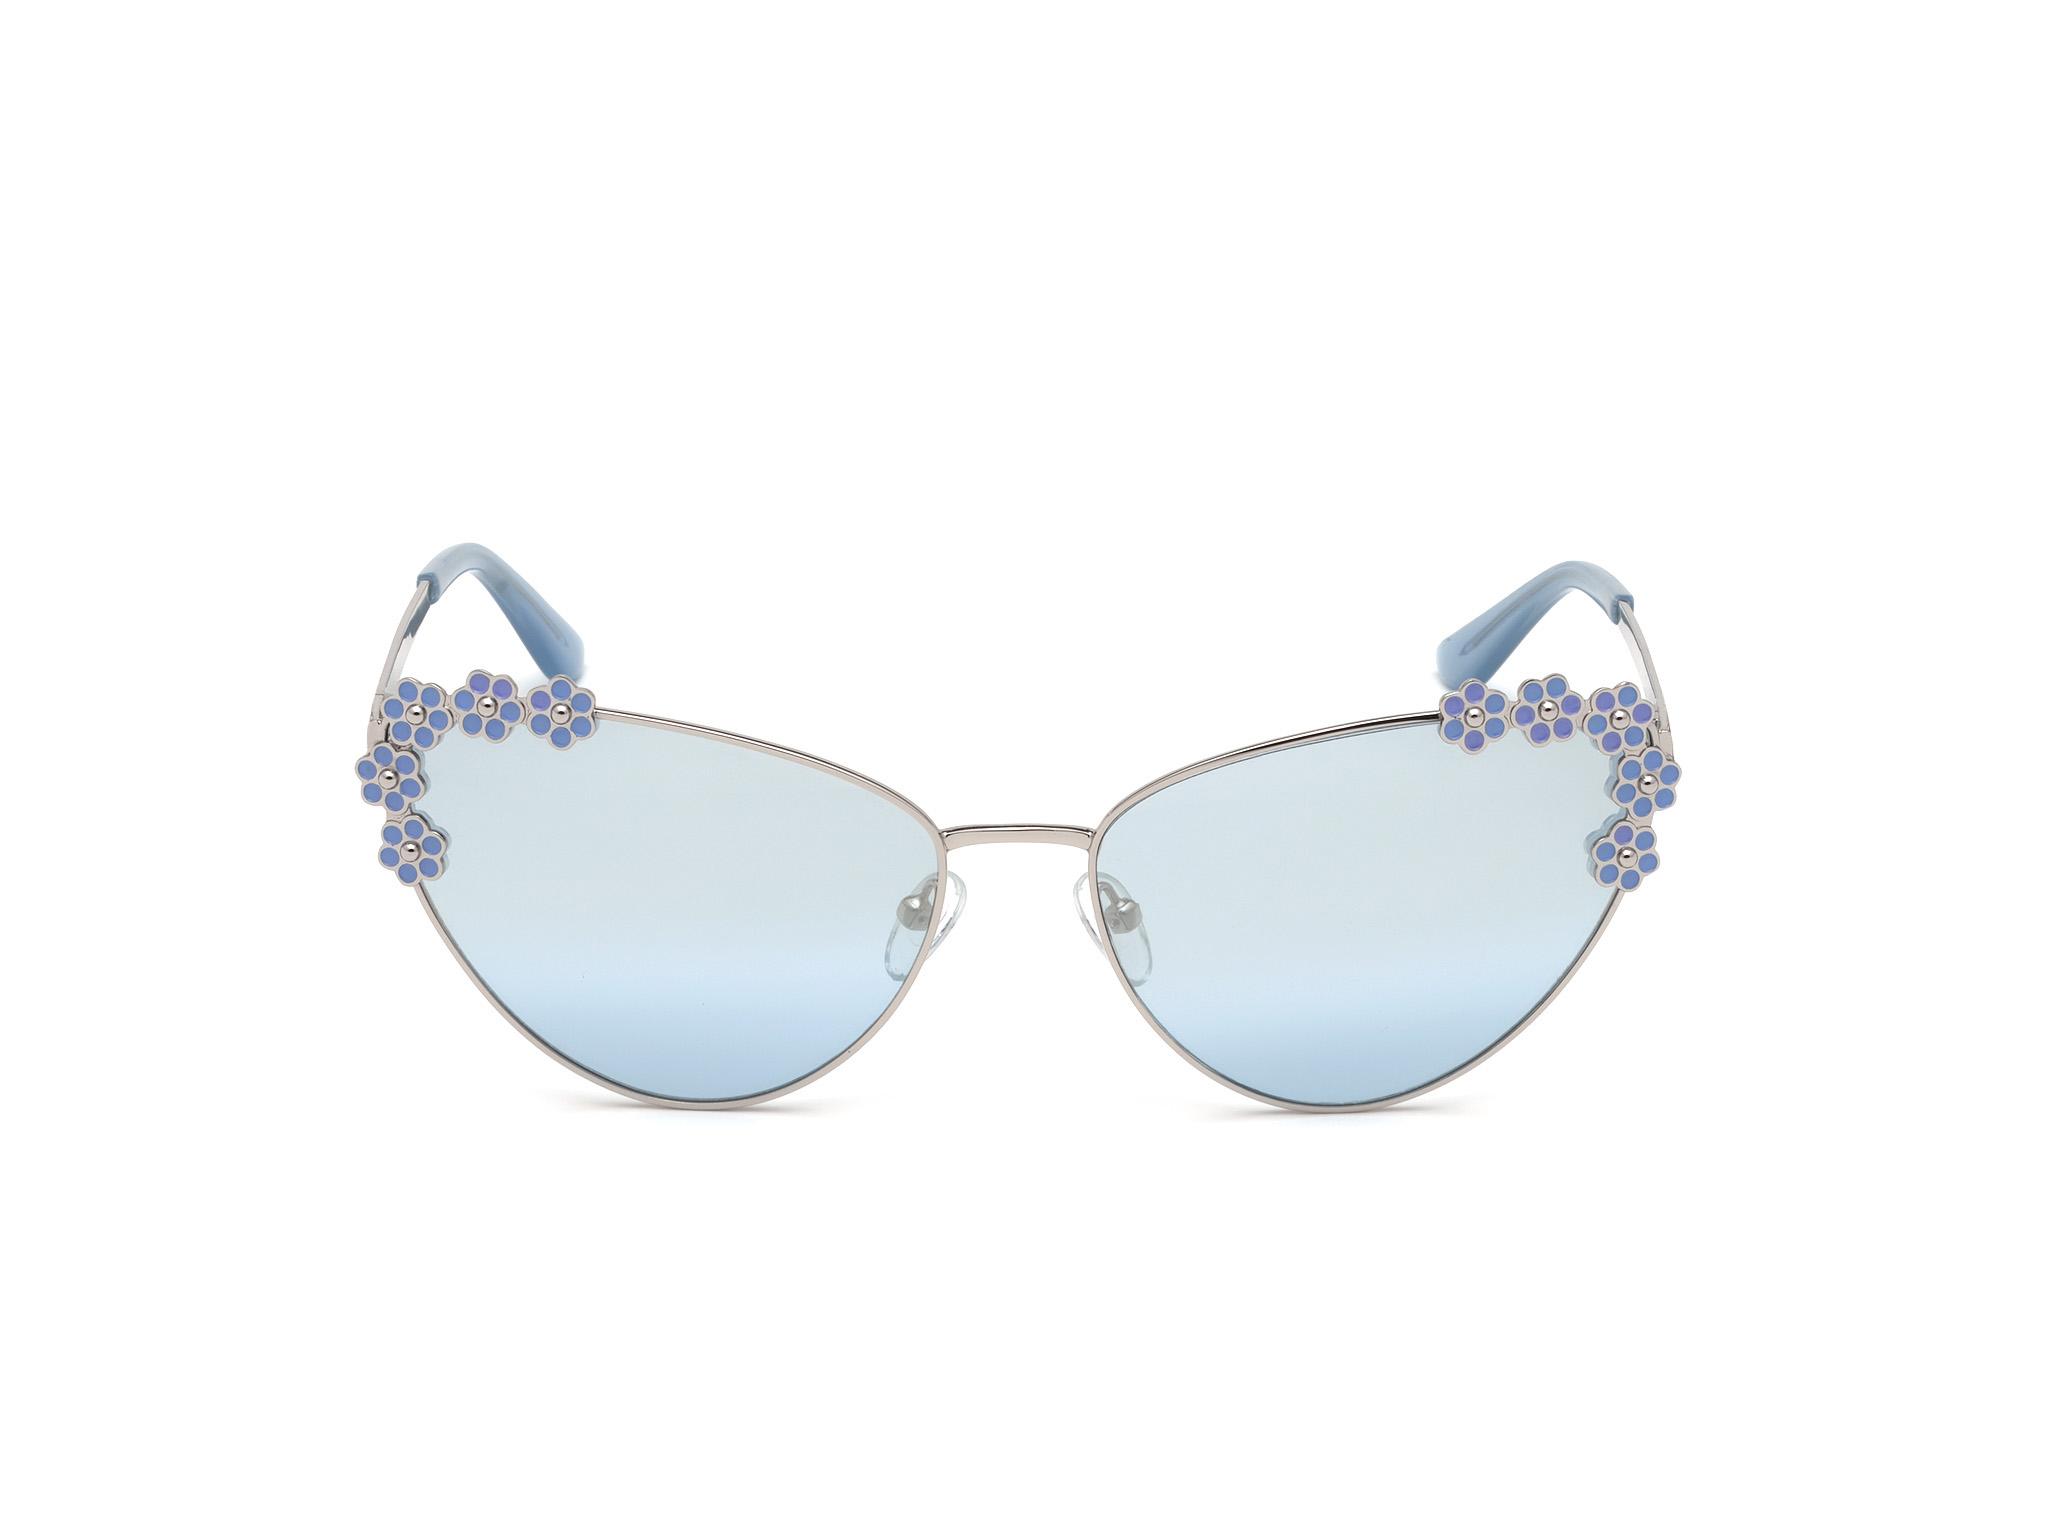 GUESS | Guess Silver Frame With Blue Lens Cat Eye Shape Women Sunglass